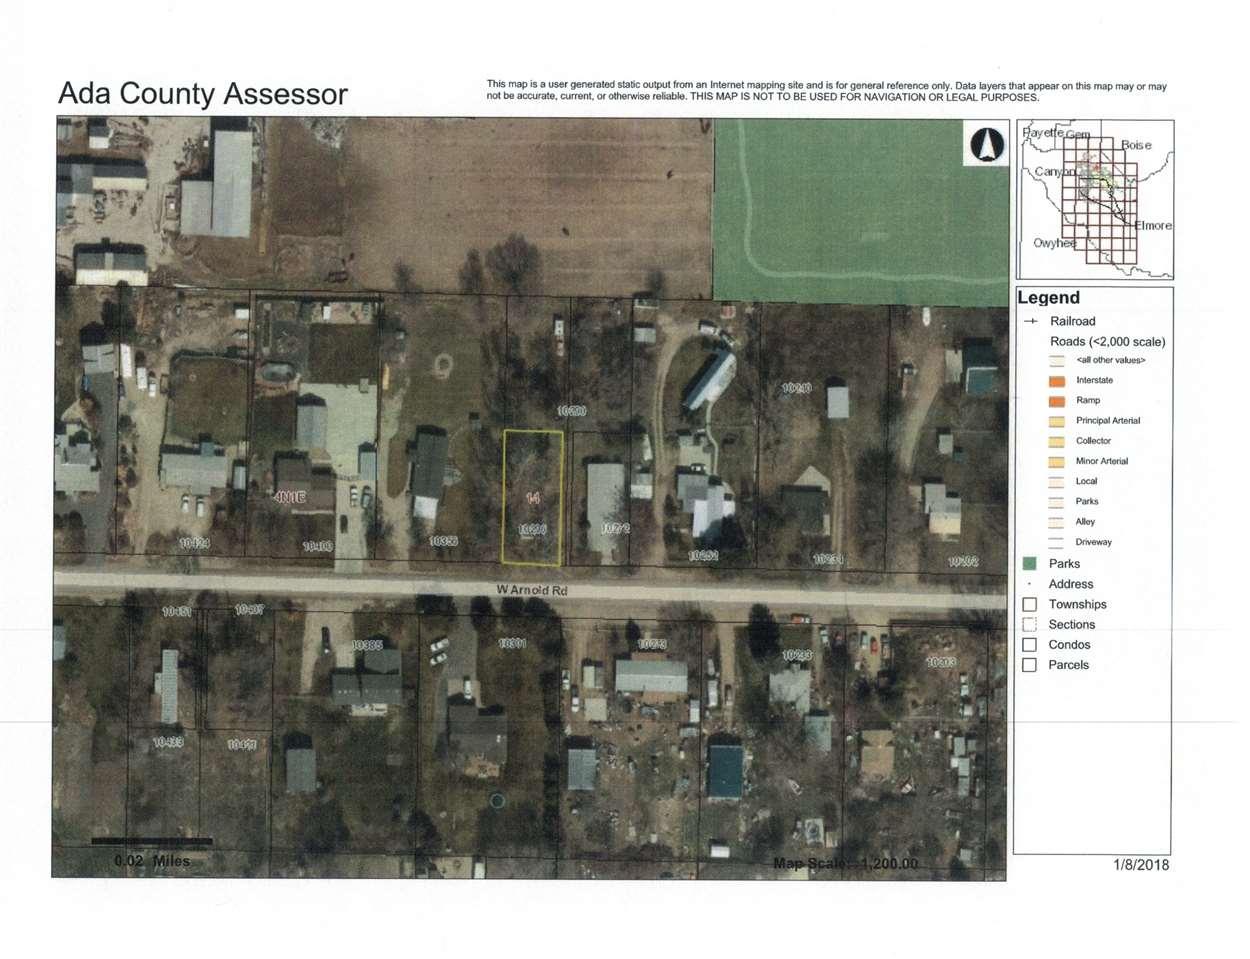 10296 W. Arnold Rd,Boise,Idaho 83714,Land,10296 W. Arnold Rd,98679346